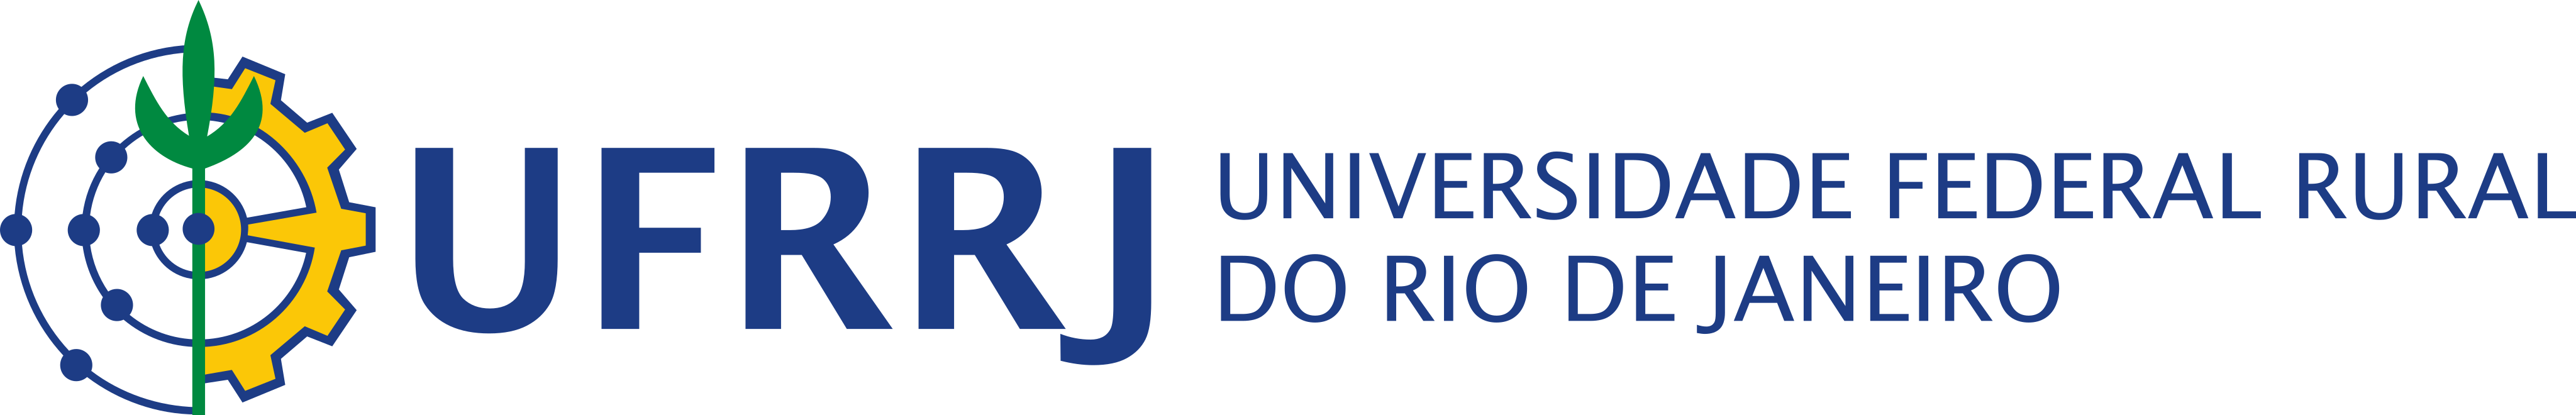 ufrrj logo 2 - UFRRJ Logo